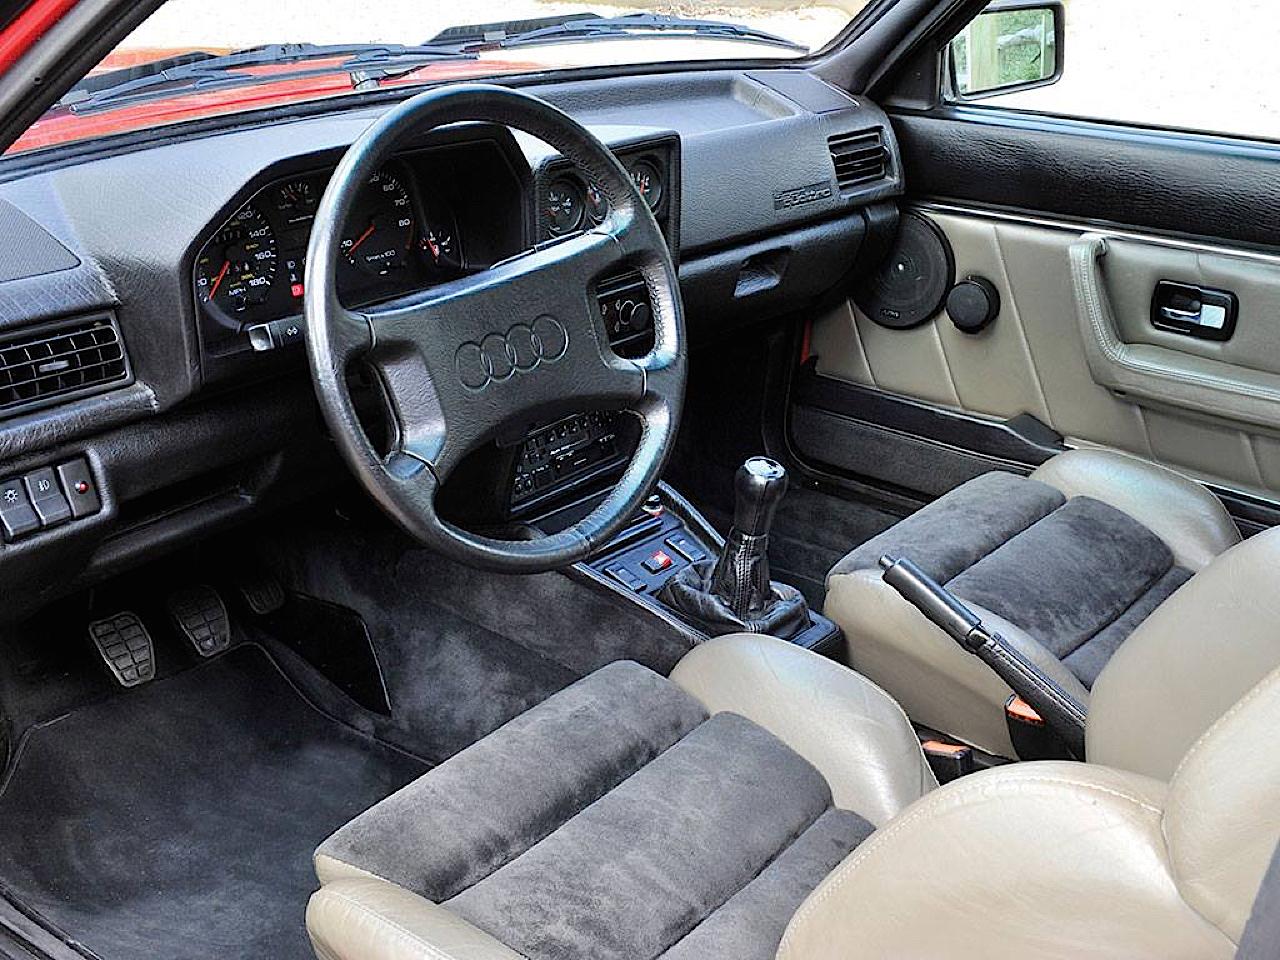 Audi Quattro Sport - Châssis court, turbo et muscu ! 5